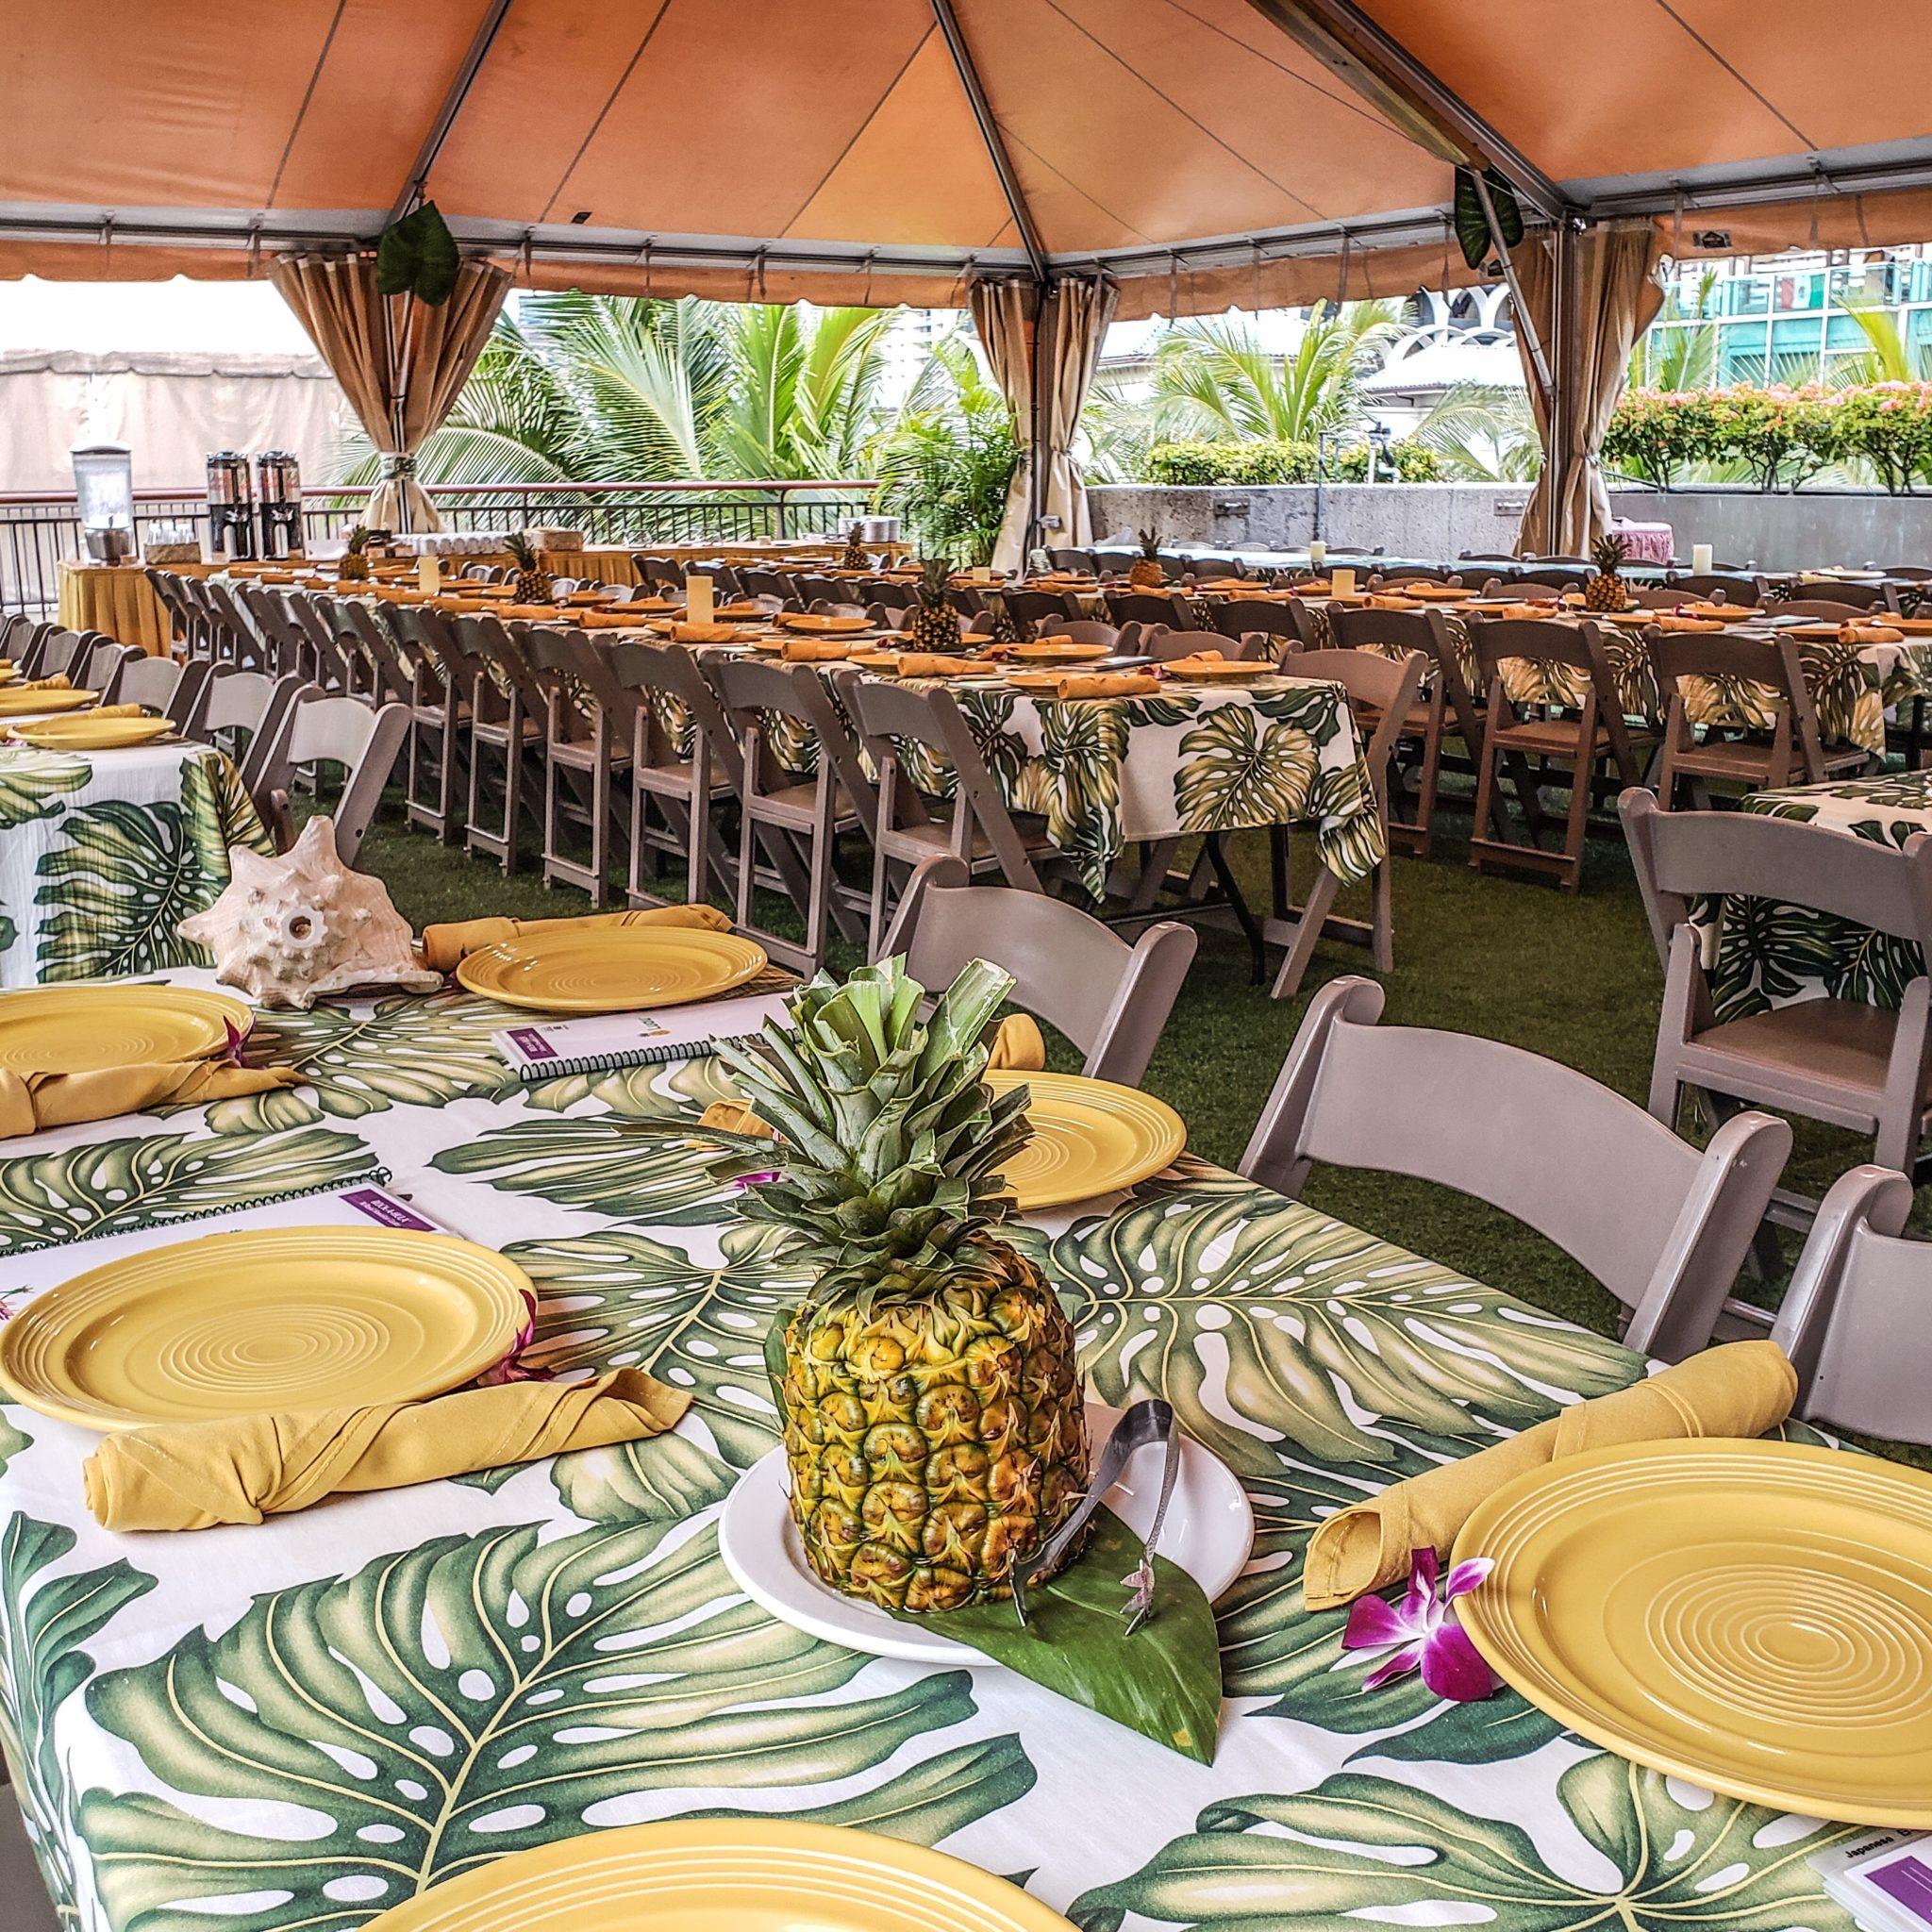 A Guide to Island Fare - My Favourite Honolulu Food Spots!